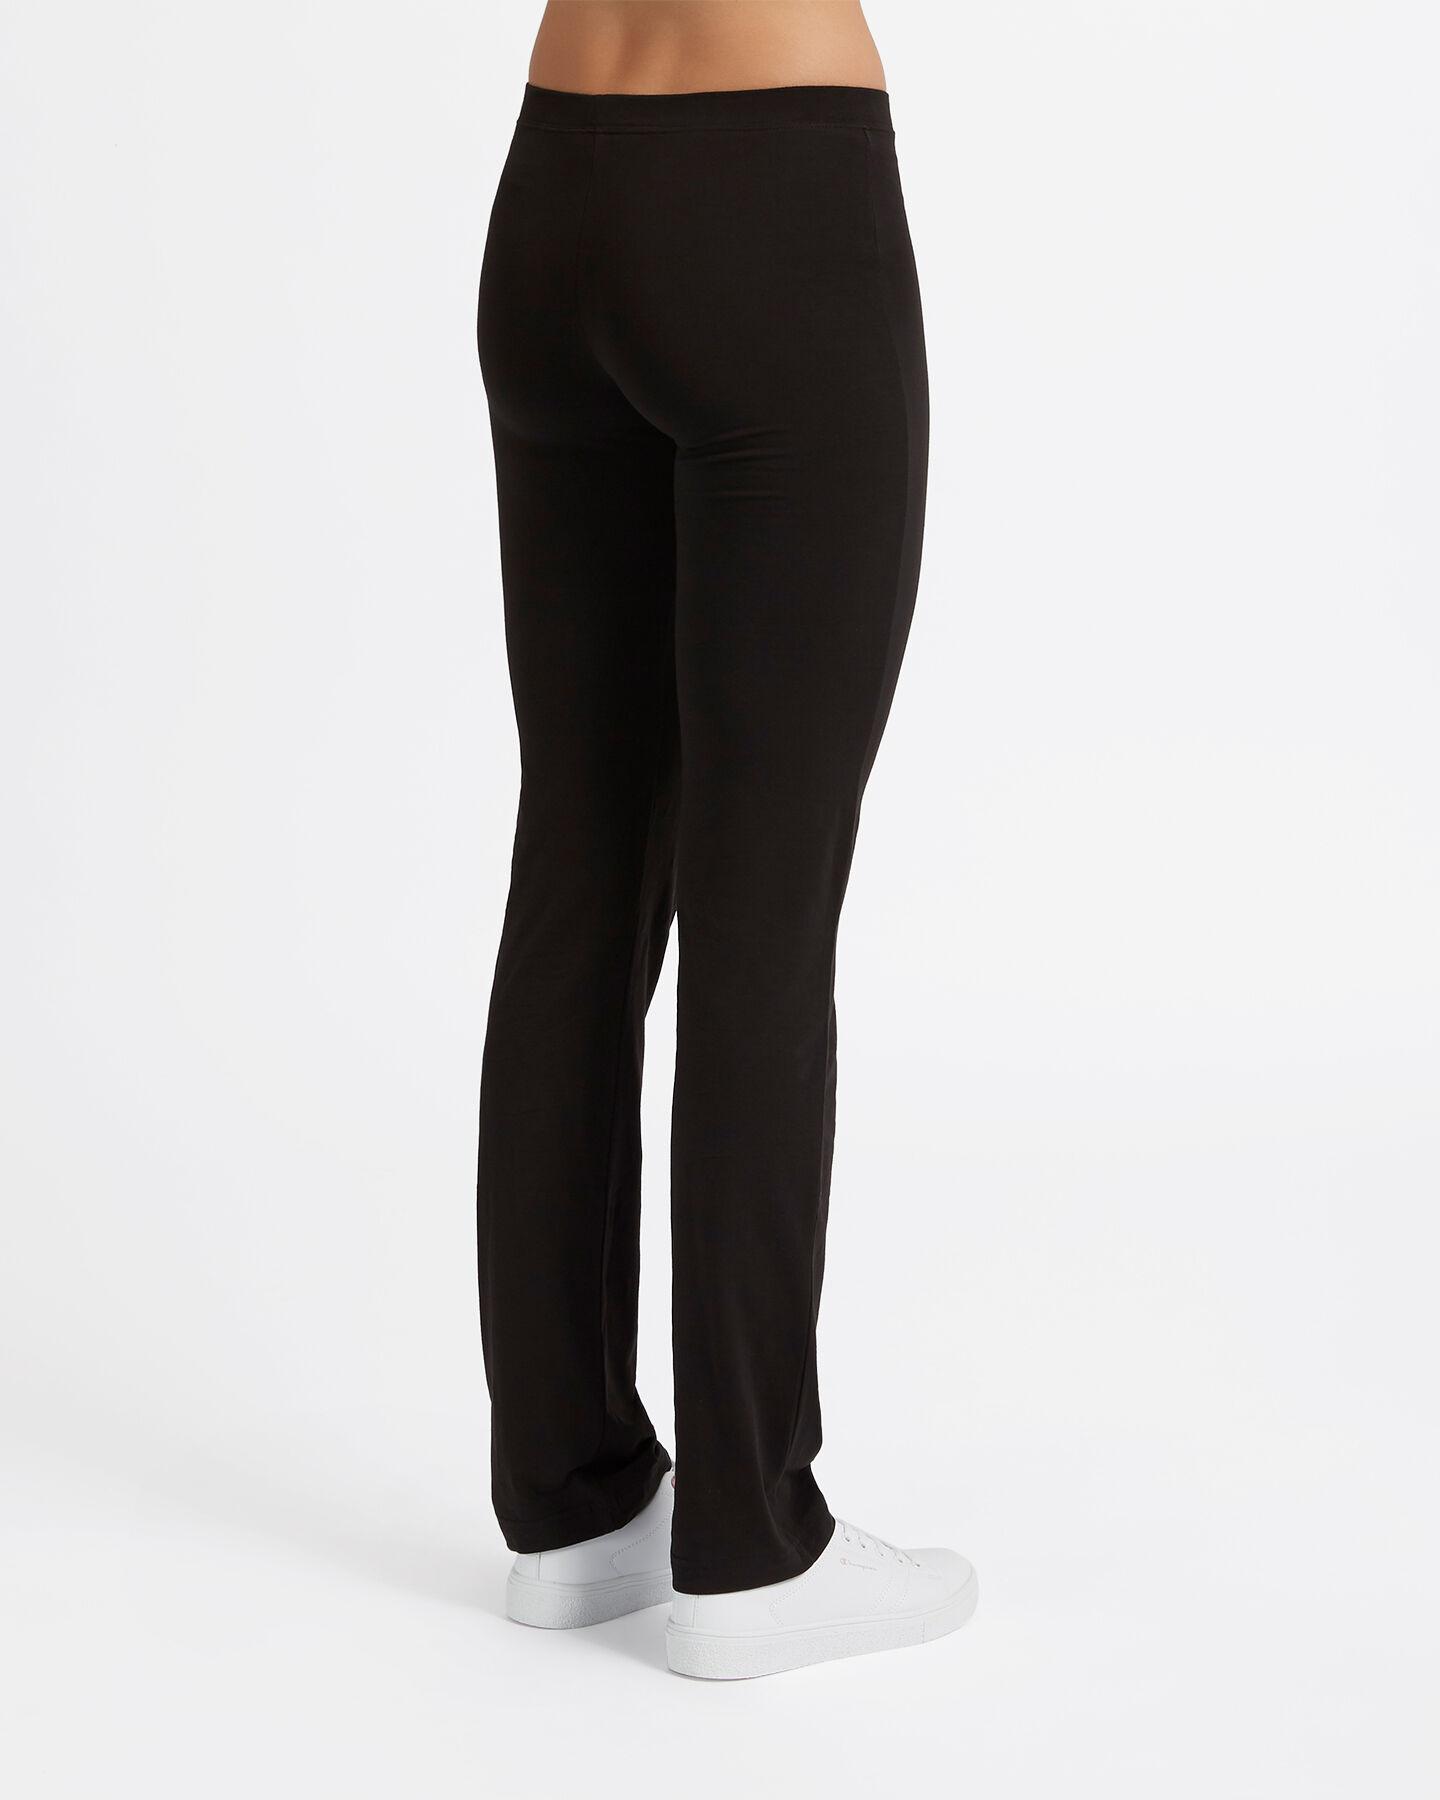 Pantalone ABC PANTAJAZZ W  S1298349 scatto 1